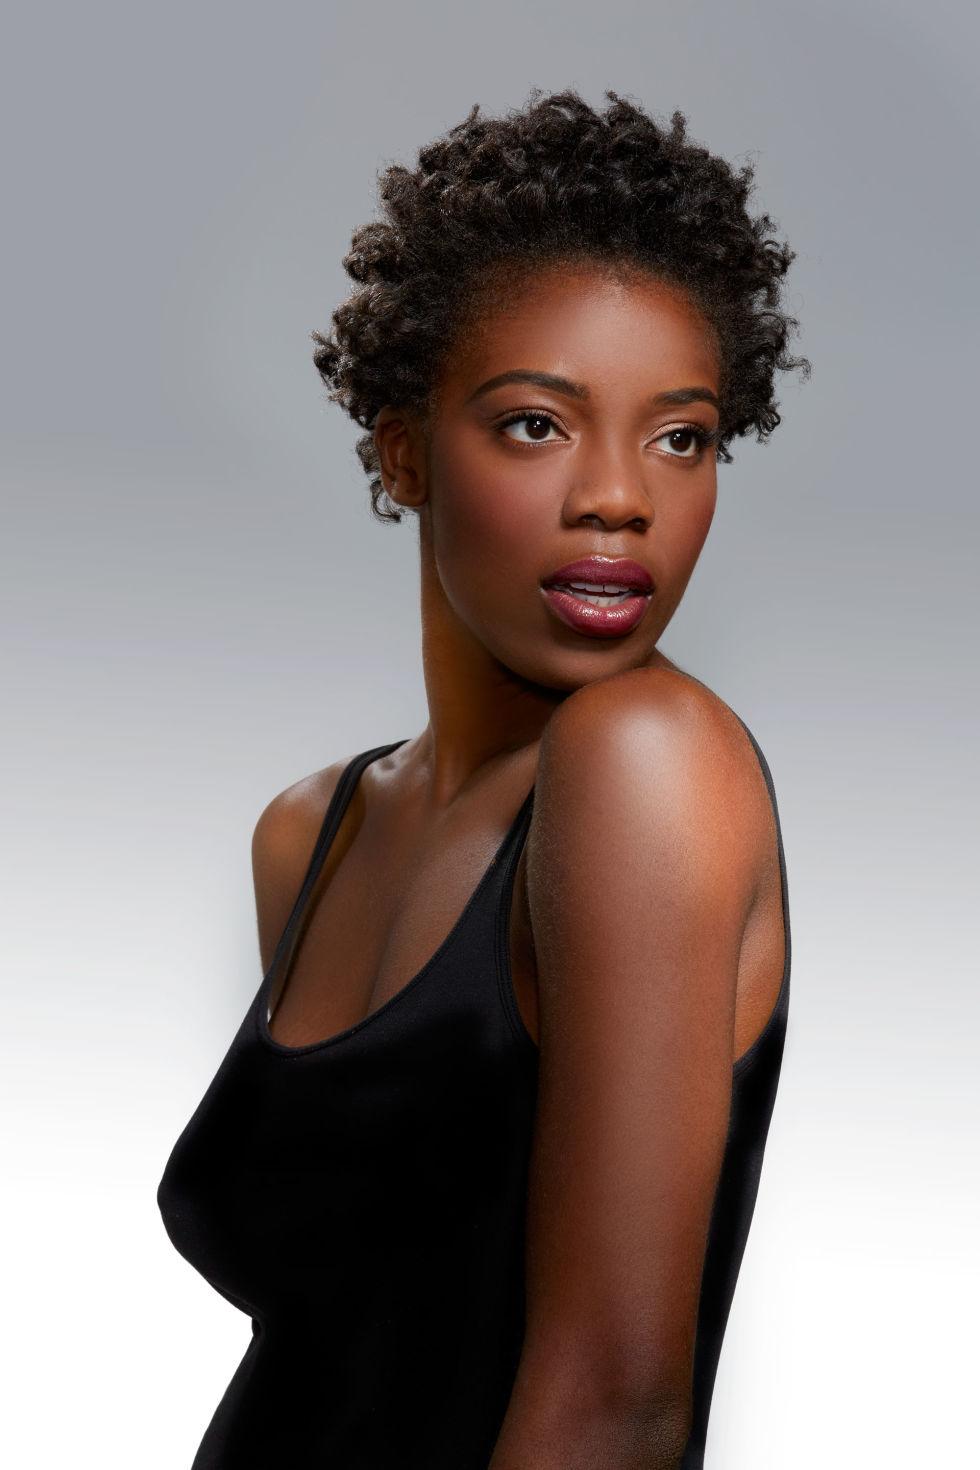 Magnificent 29 Black Hairstyles Best African American Hairstyles Amp Haircuts Short Hairstyles For Black Women Fulllsitofus